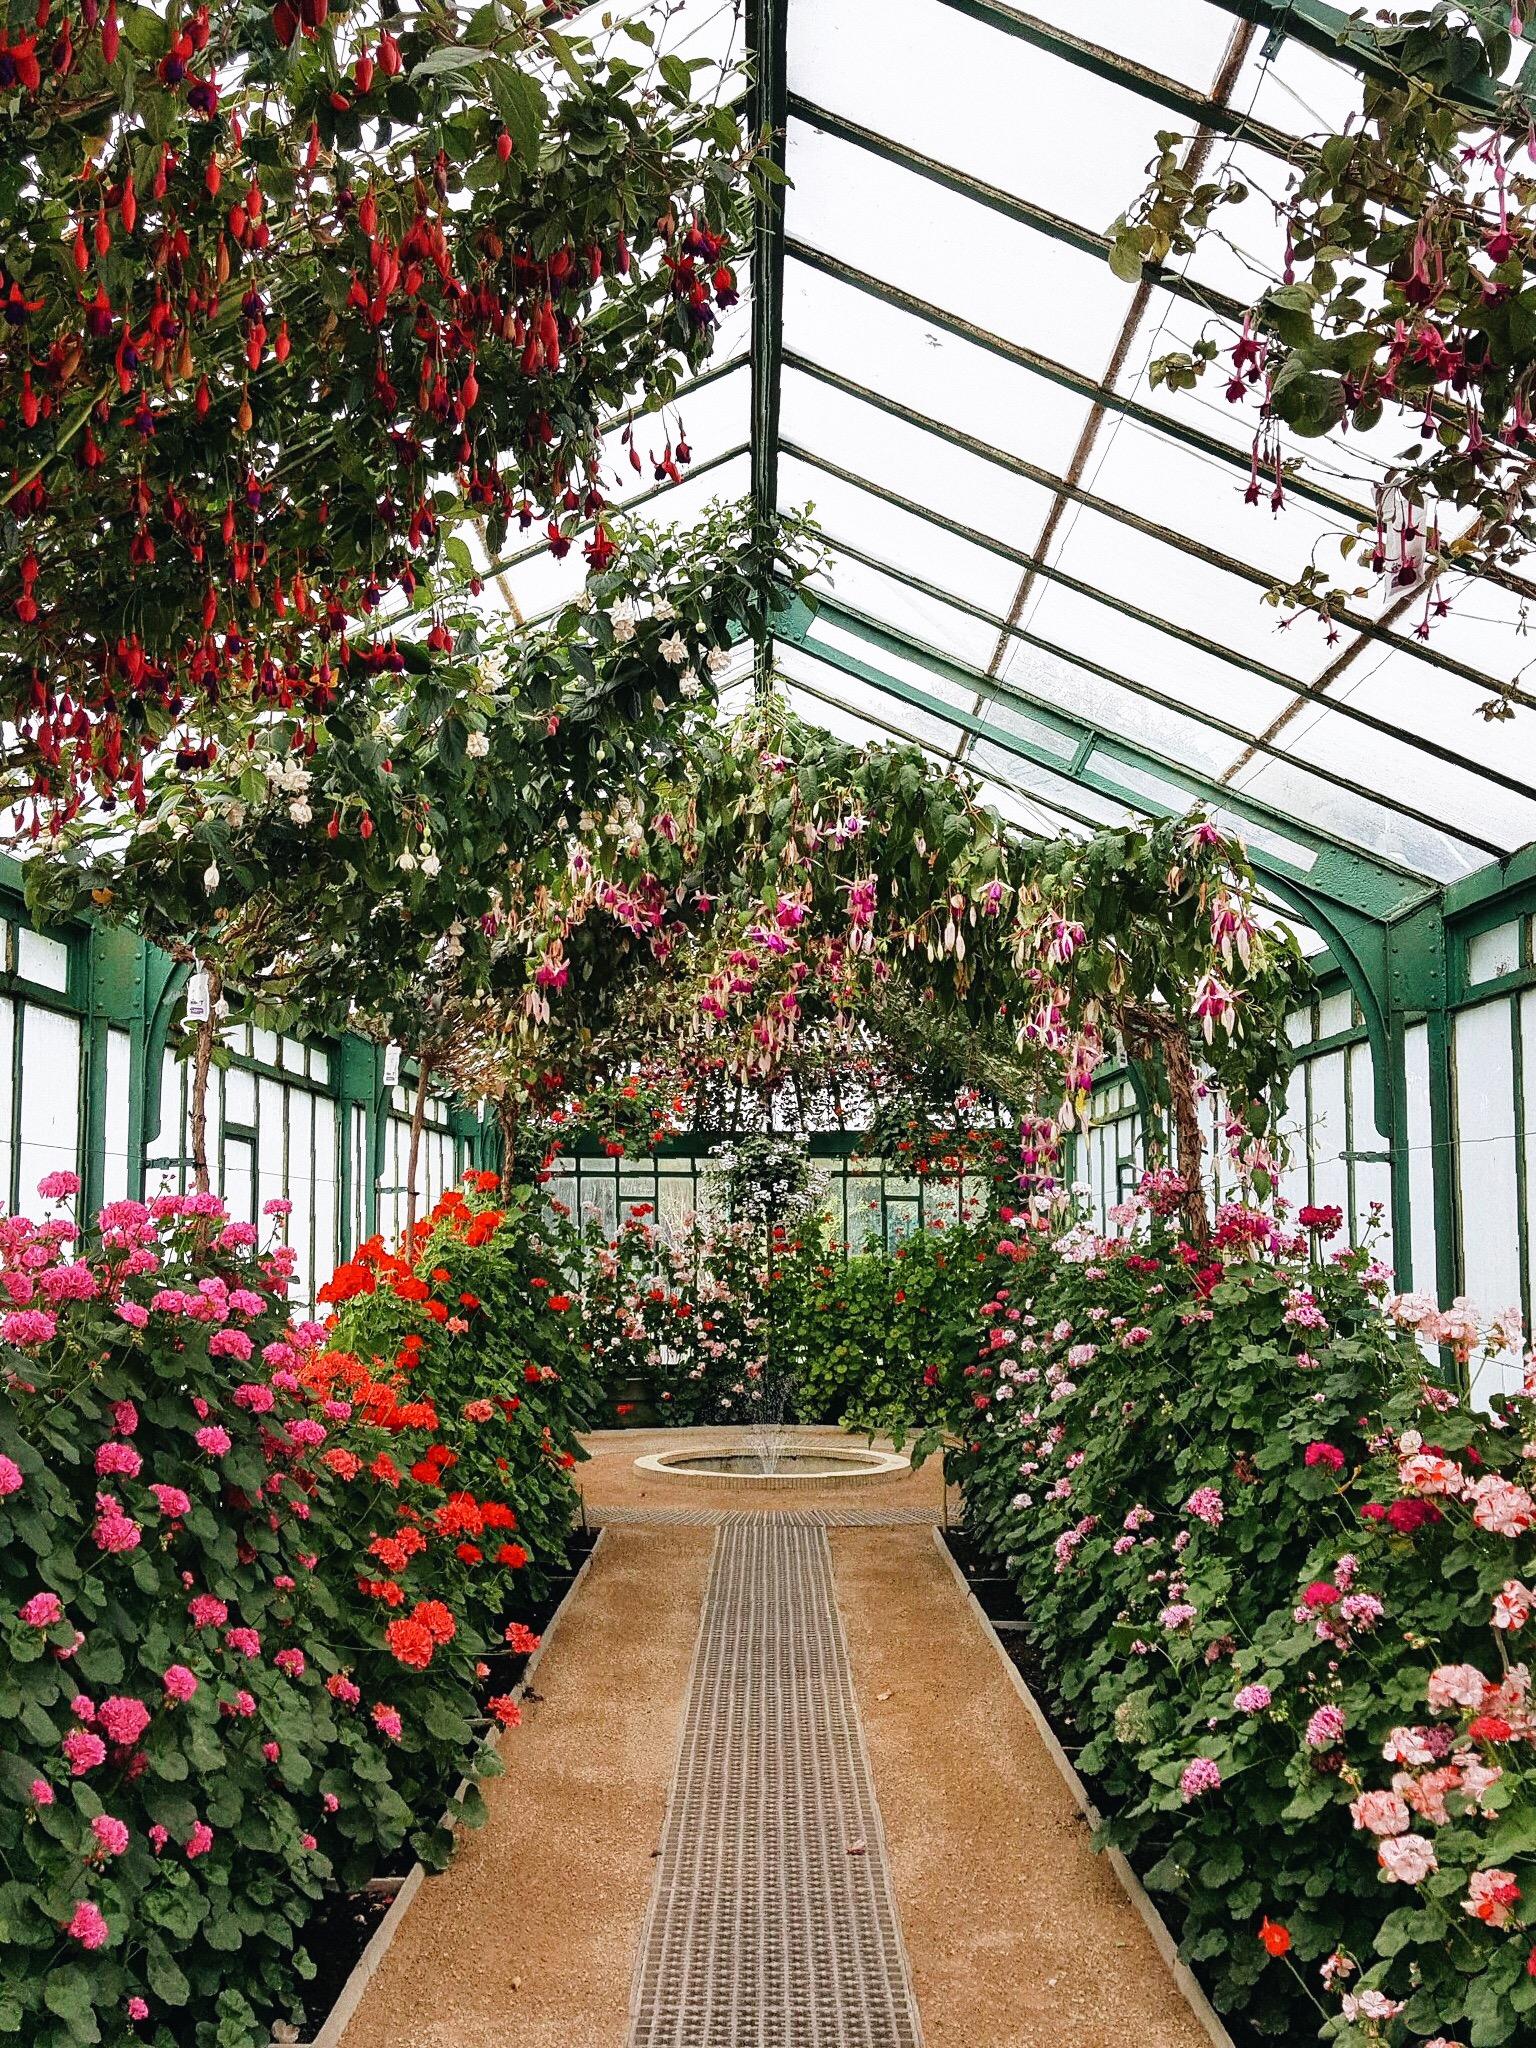 Brussels royal greenhouse garden